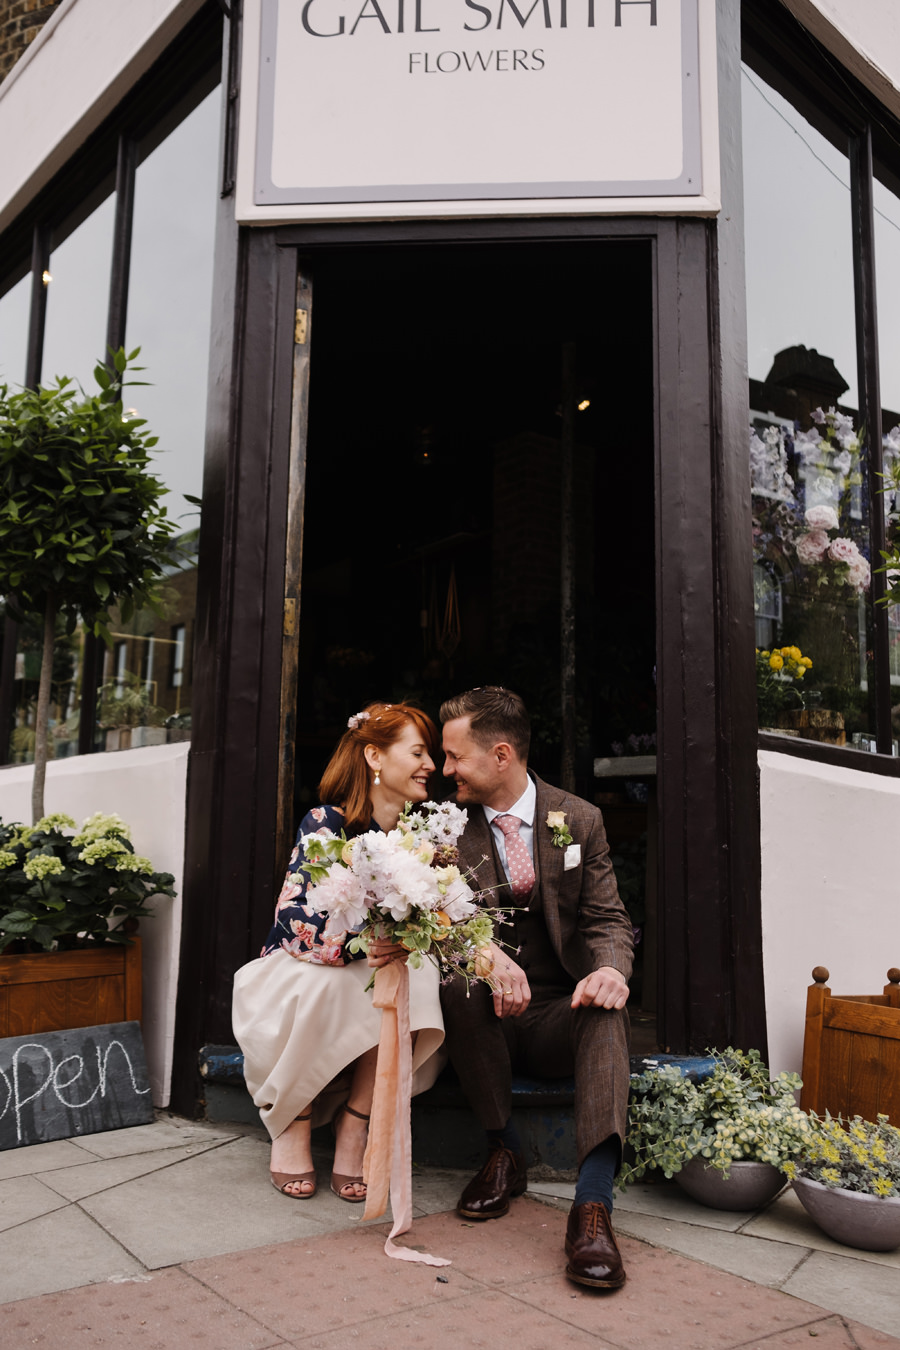 London Wedding Photographer couple gail smith flowers